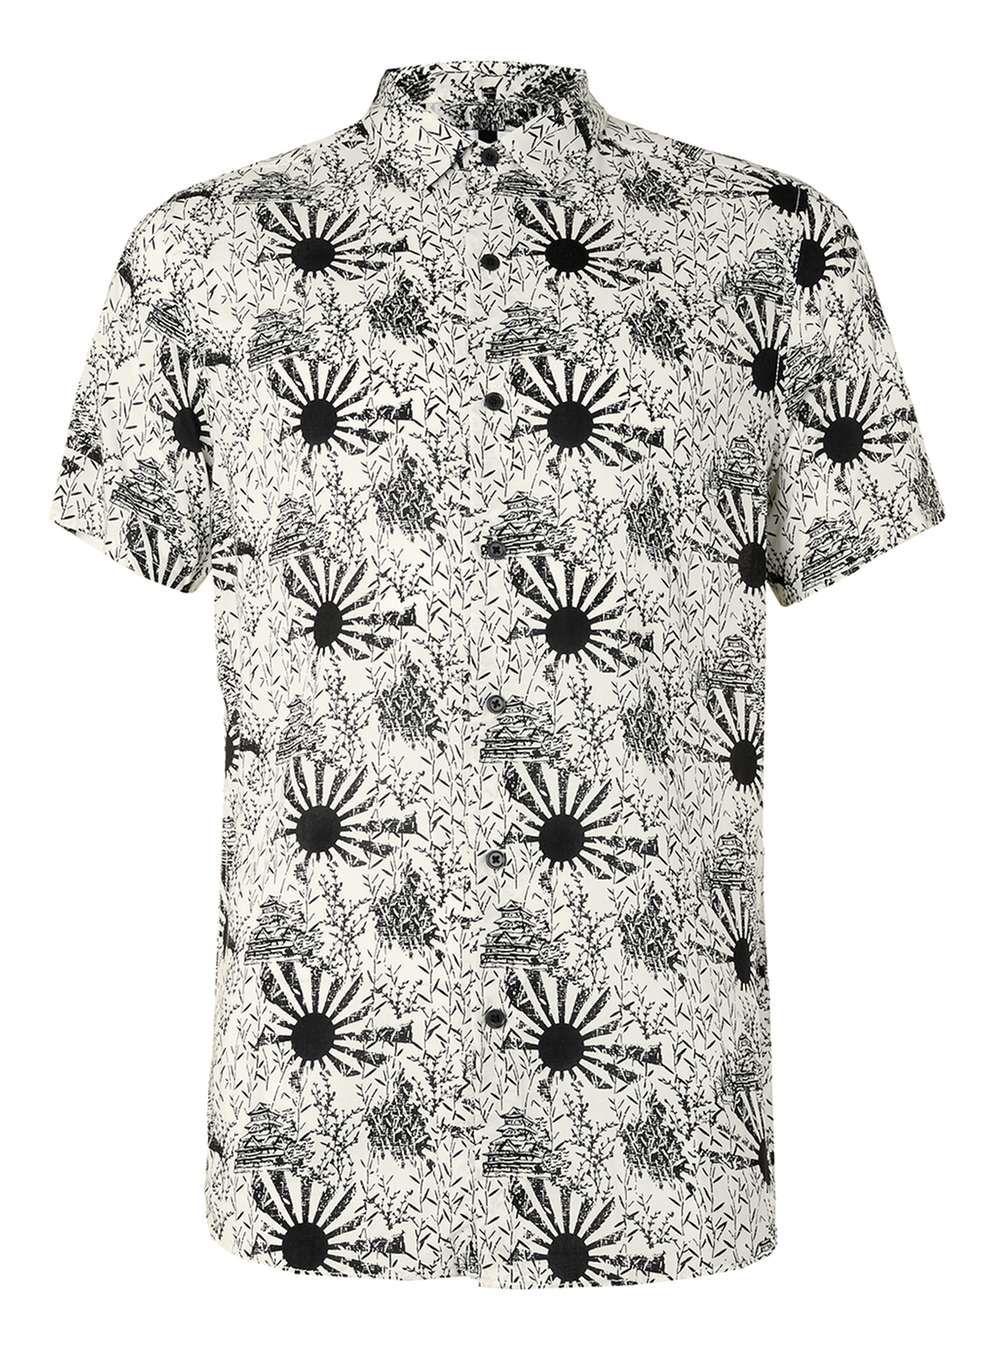 48b6e5188520 Off White and Black Sun Print Casual Shirt